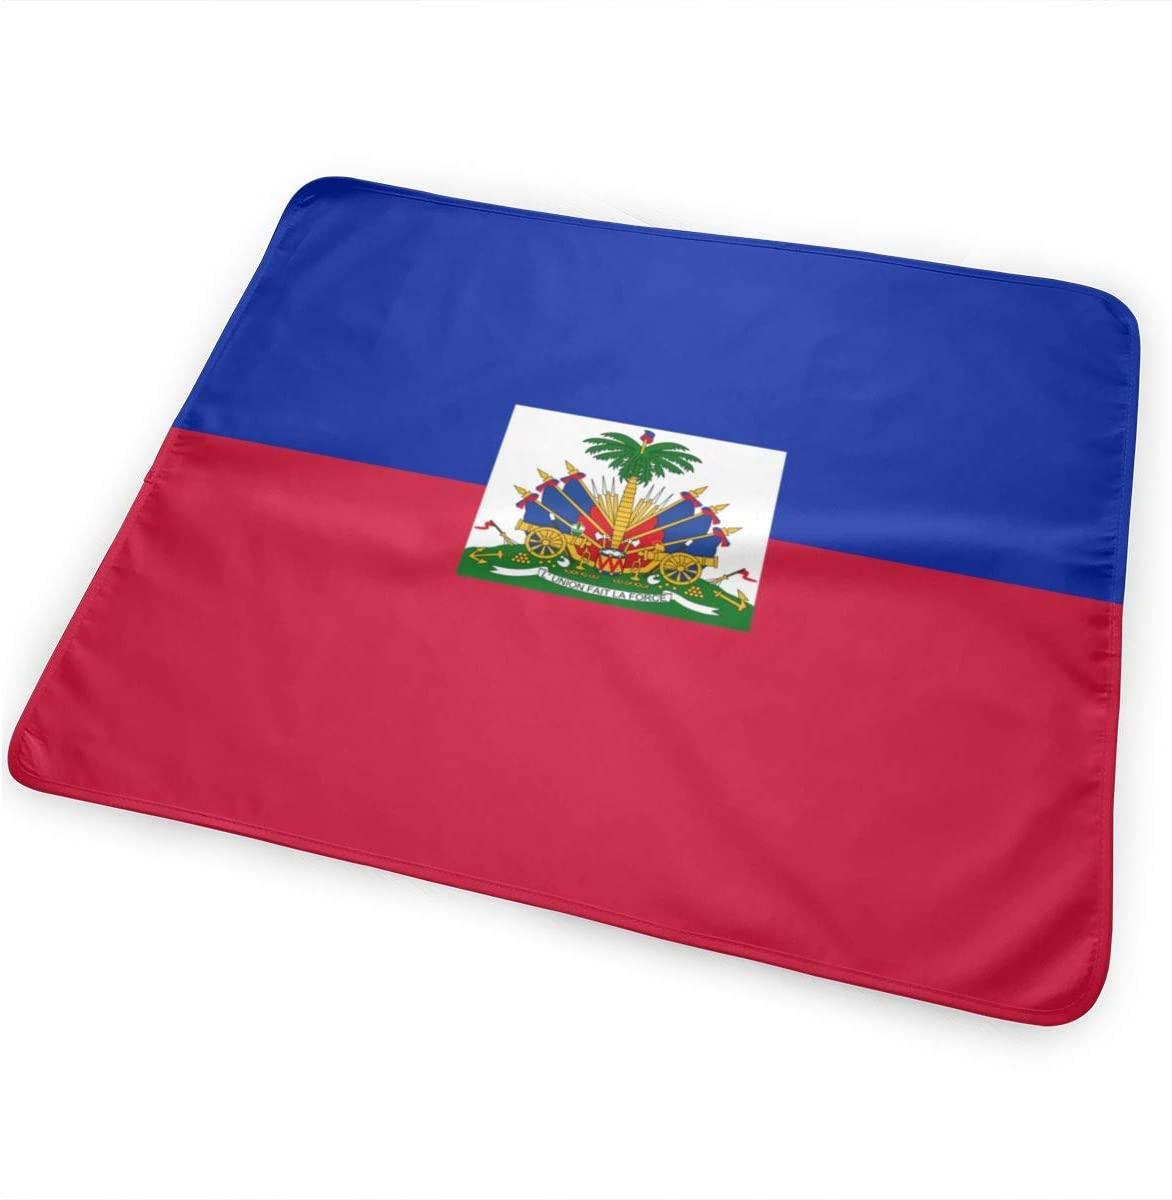 Haiti Flag Breathable Urine Mat Waterproof Changing Pad for Baby Washable Mattress Pad Sheet Protector